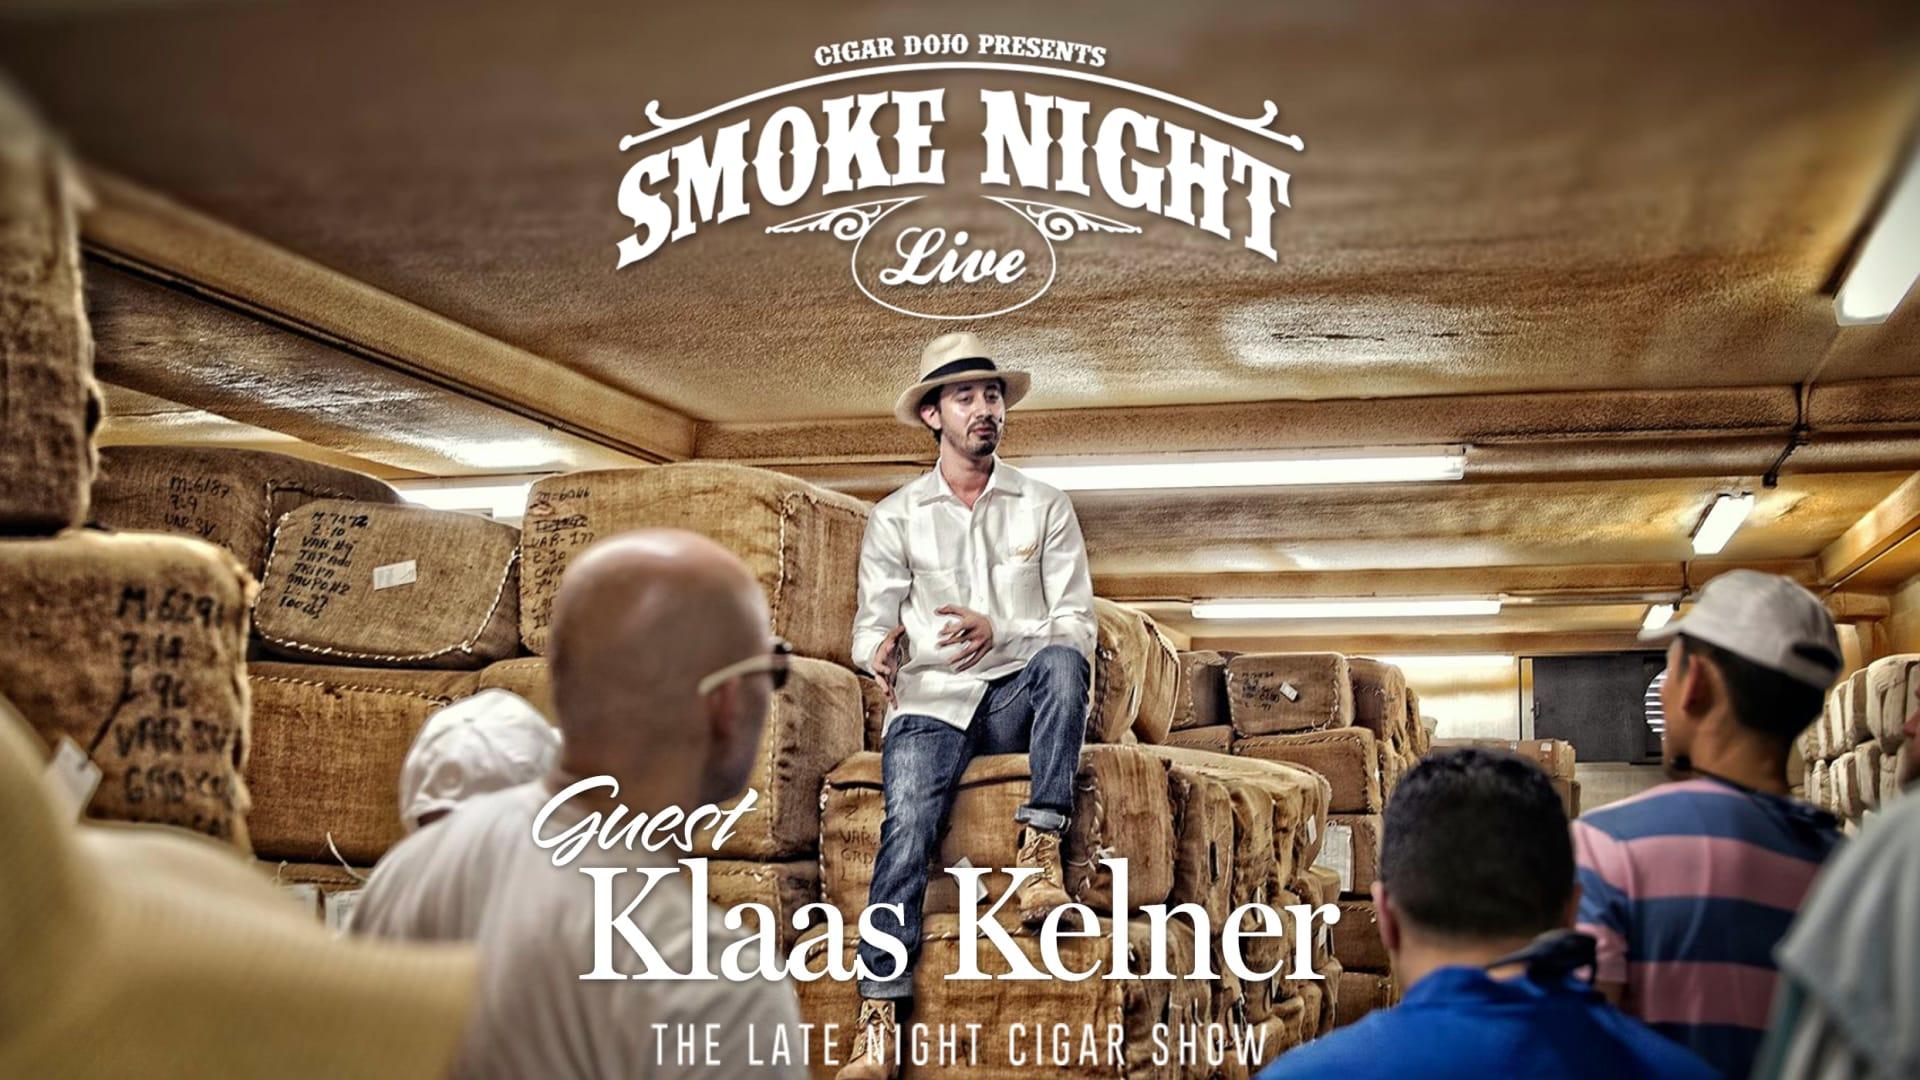 Smoke Night LIVE with Davidoff's Klaas Kelner Featured Image